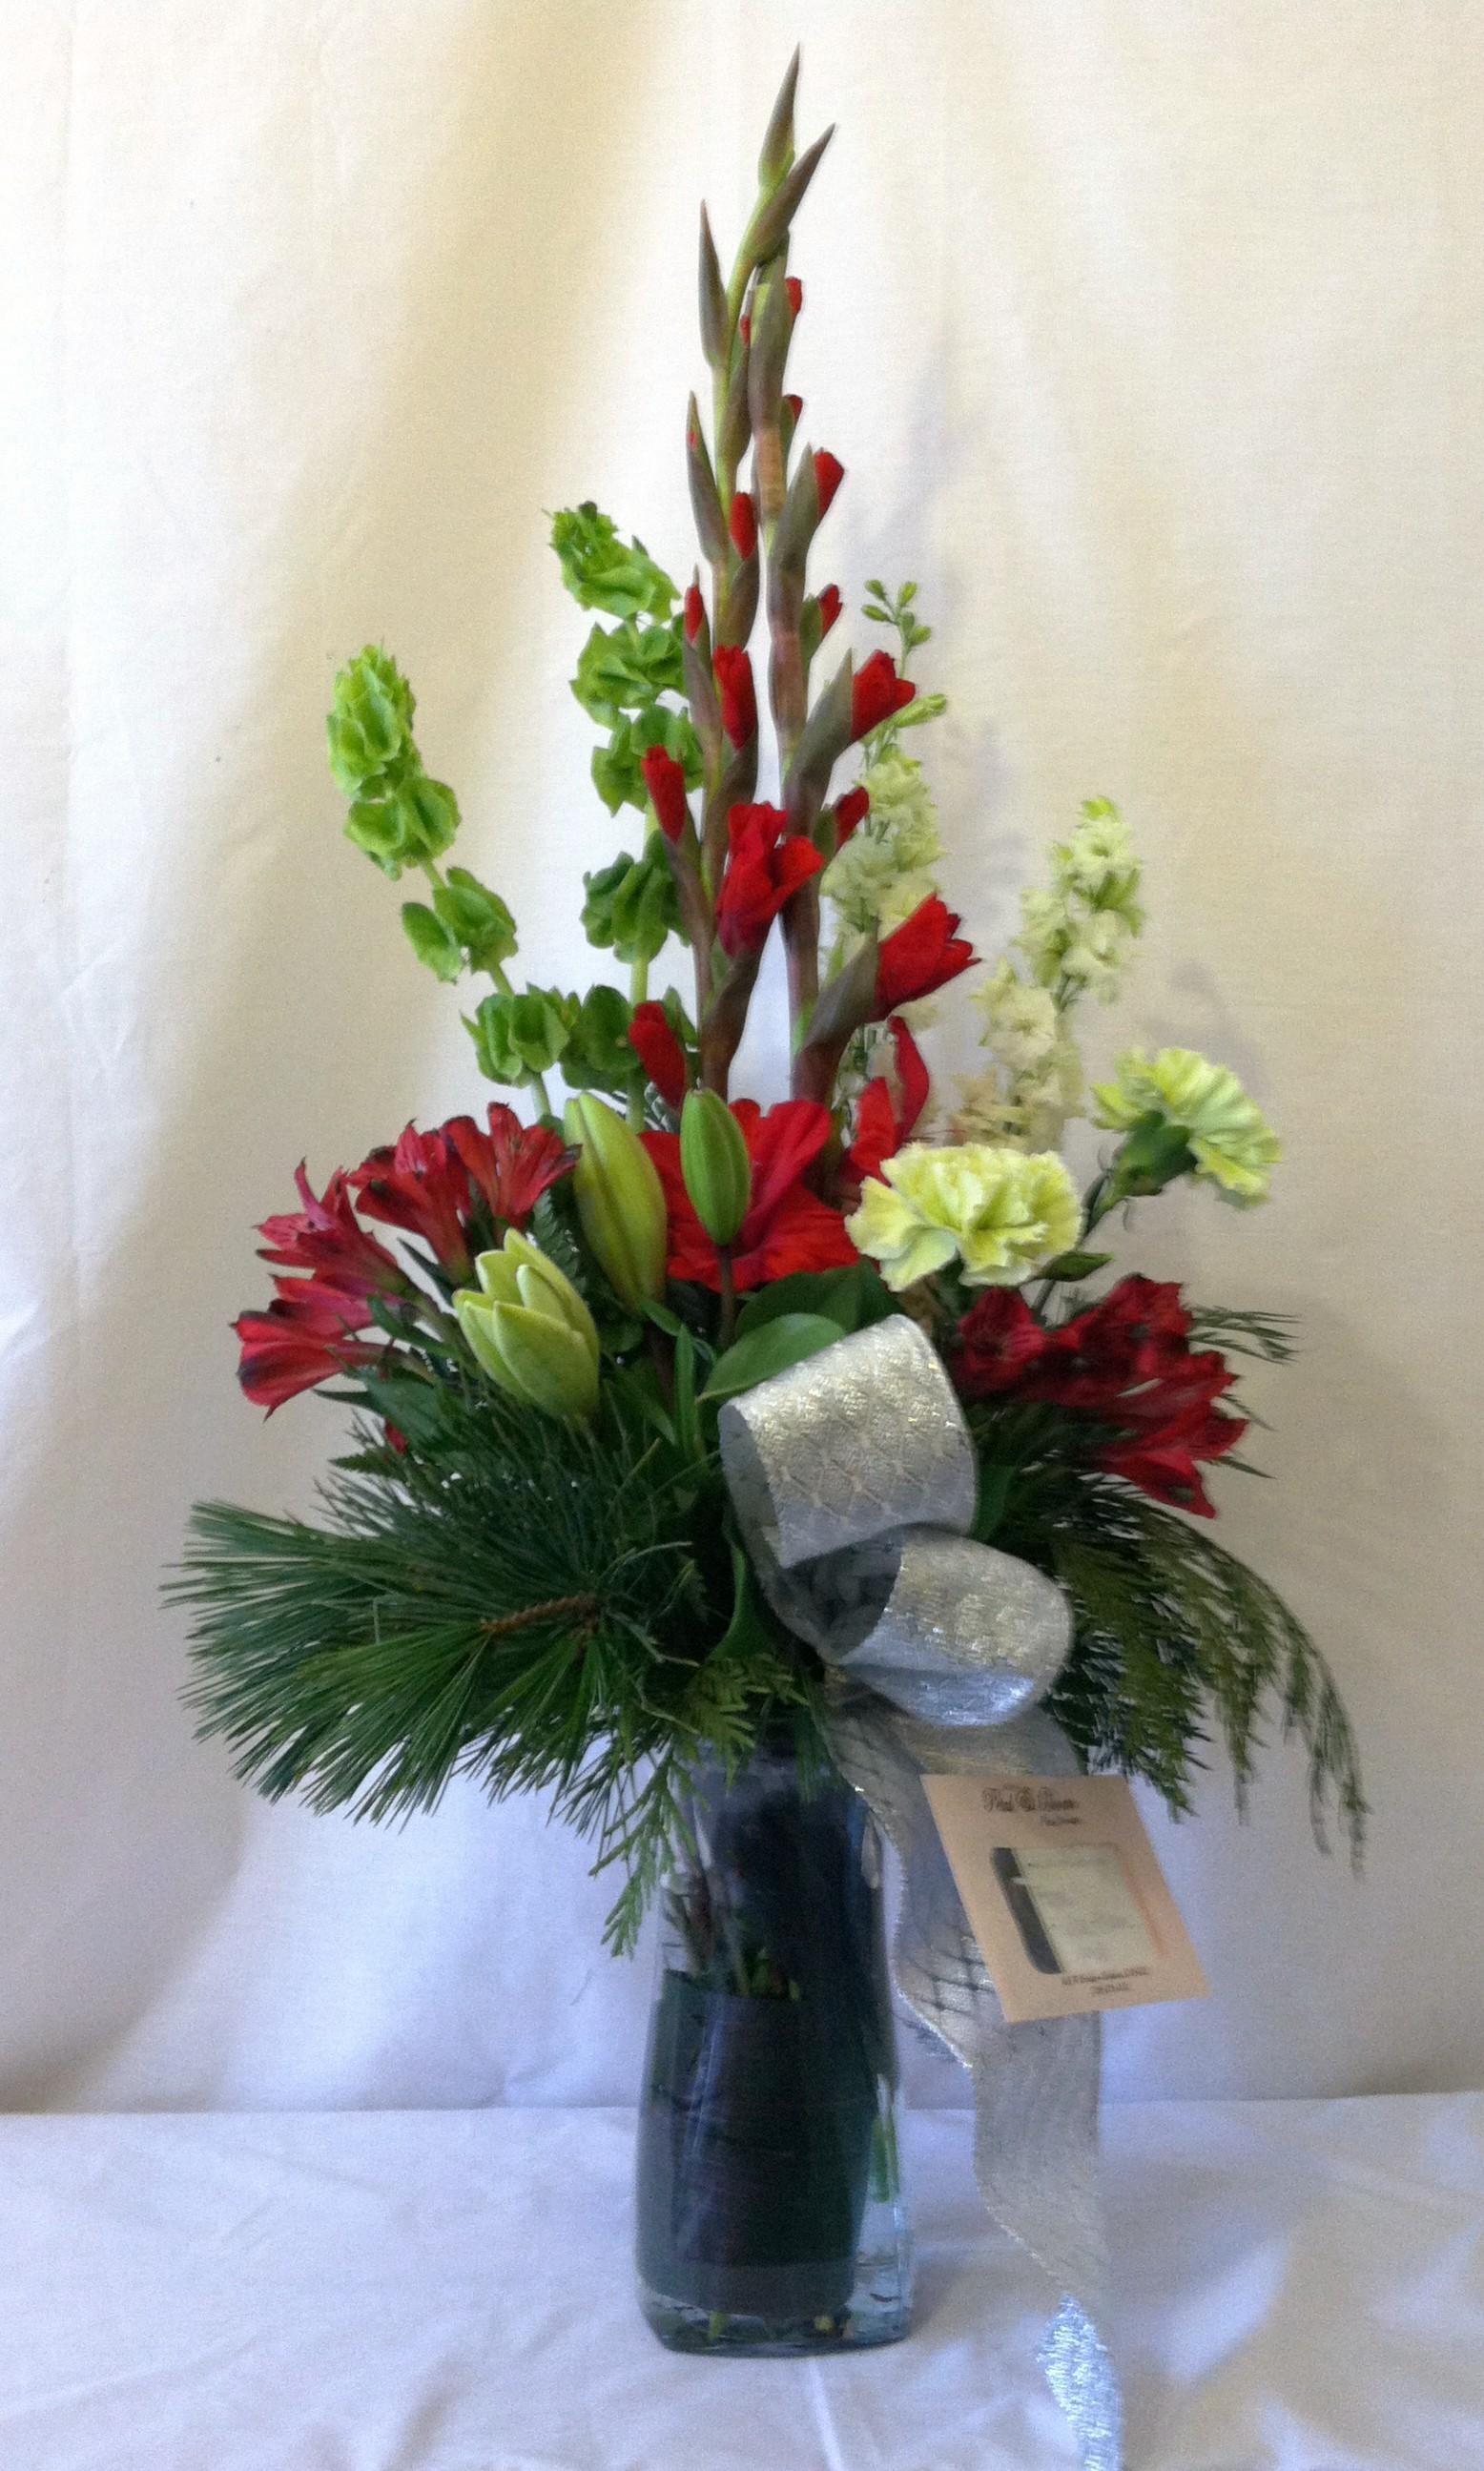 Vased Holiday Memory Arrangement